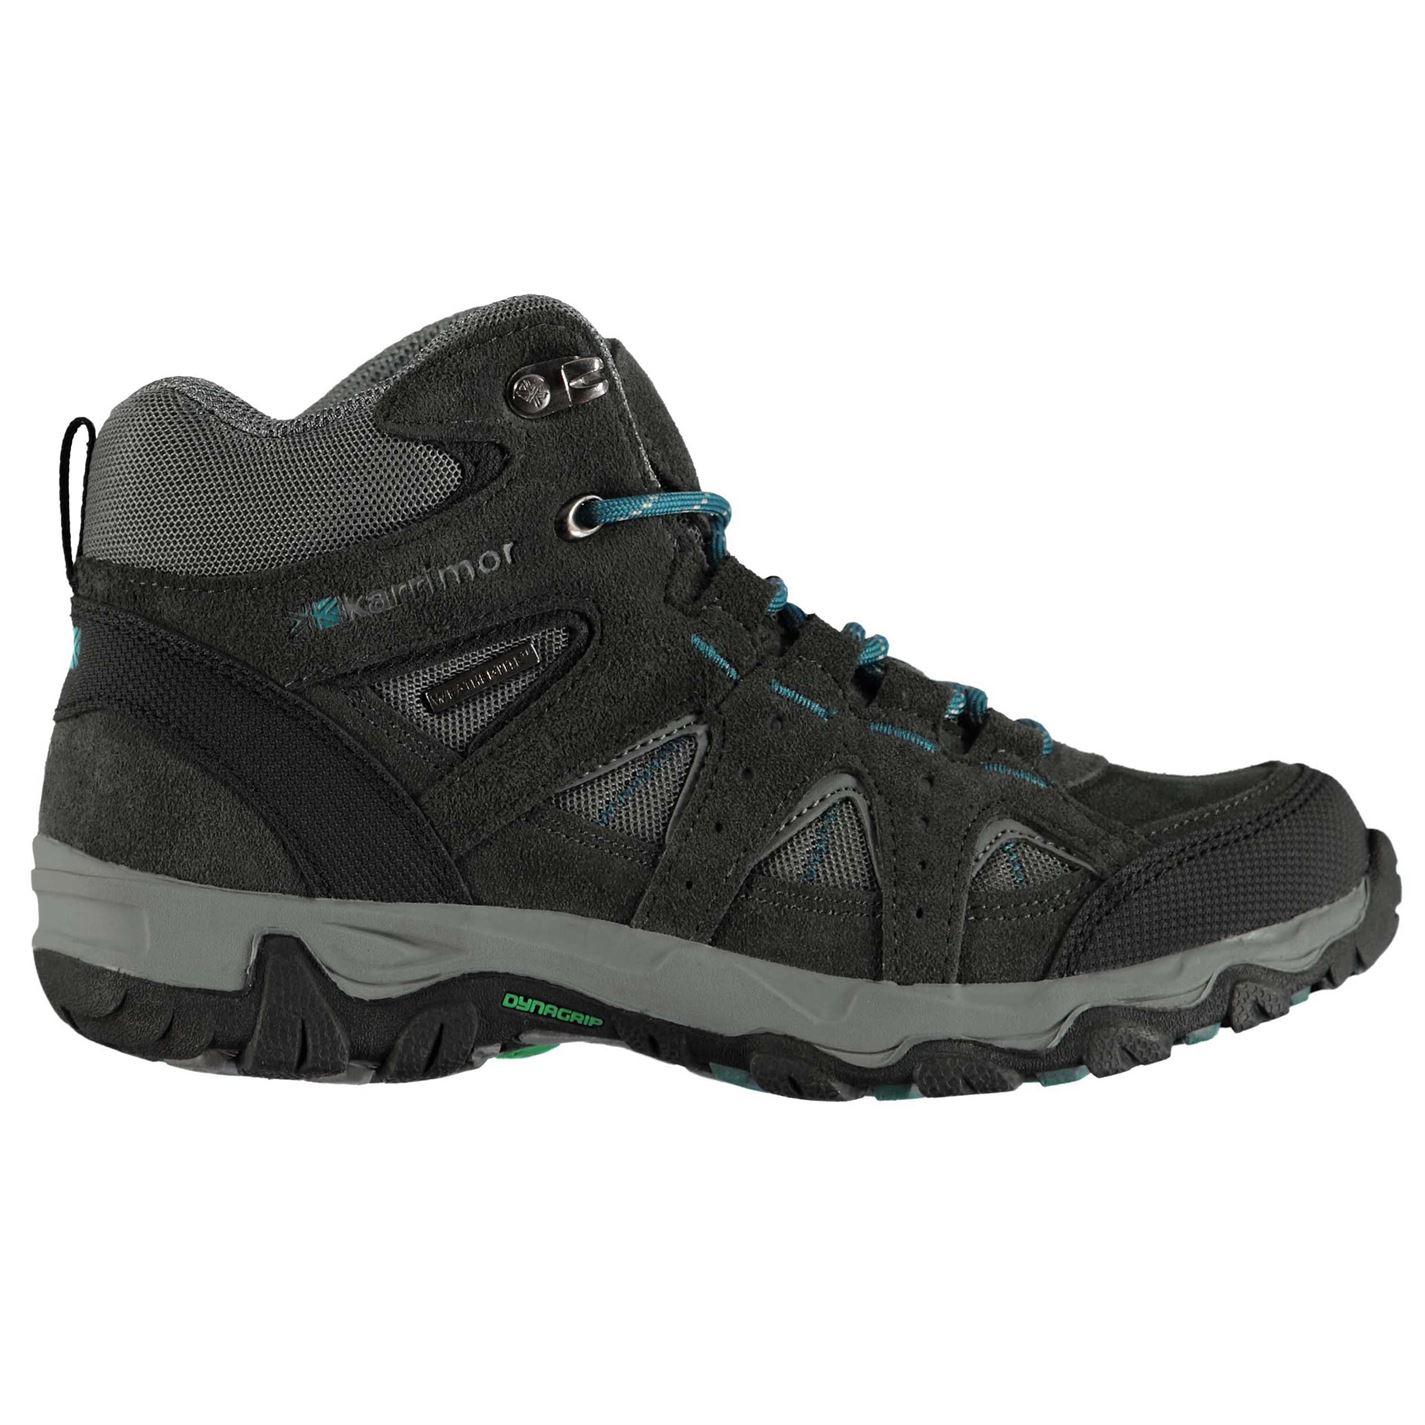 Karrimor Mount Mid Junior Walking Shoes